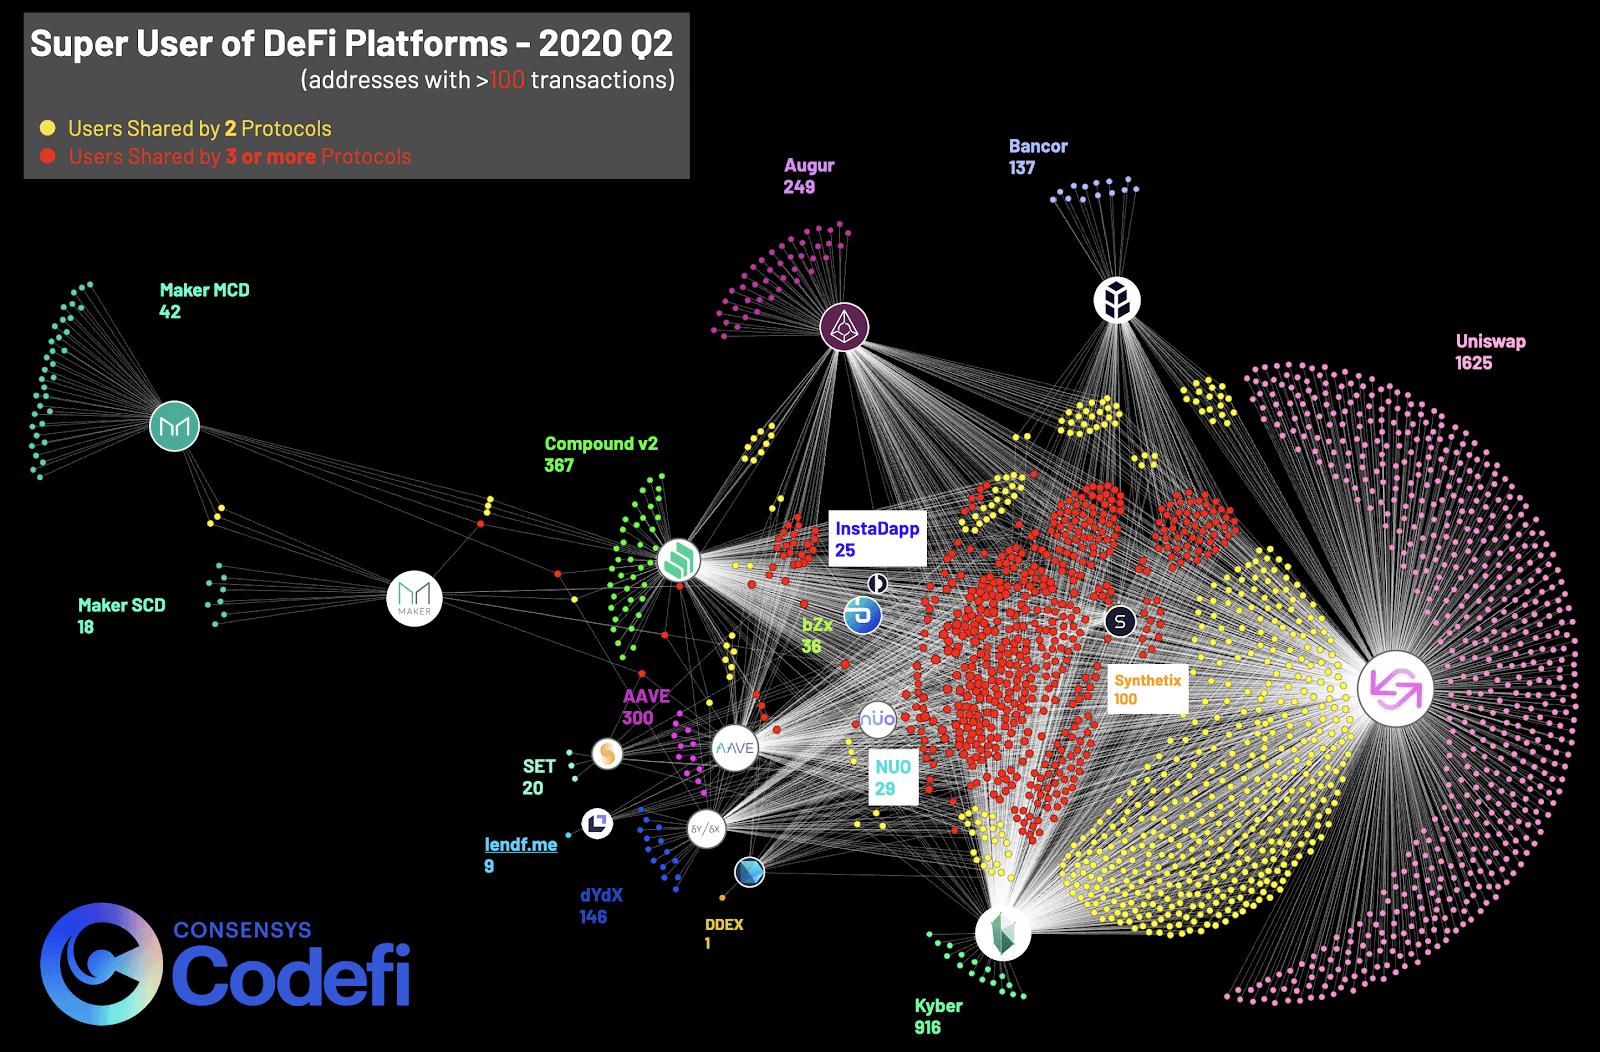 Super users of DeFi platforms – 2020 Q2